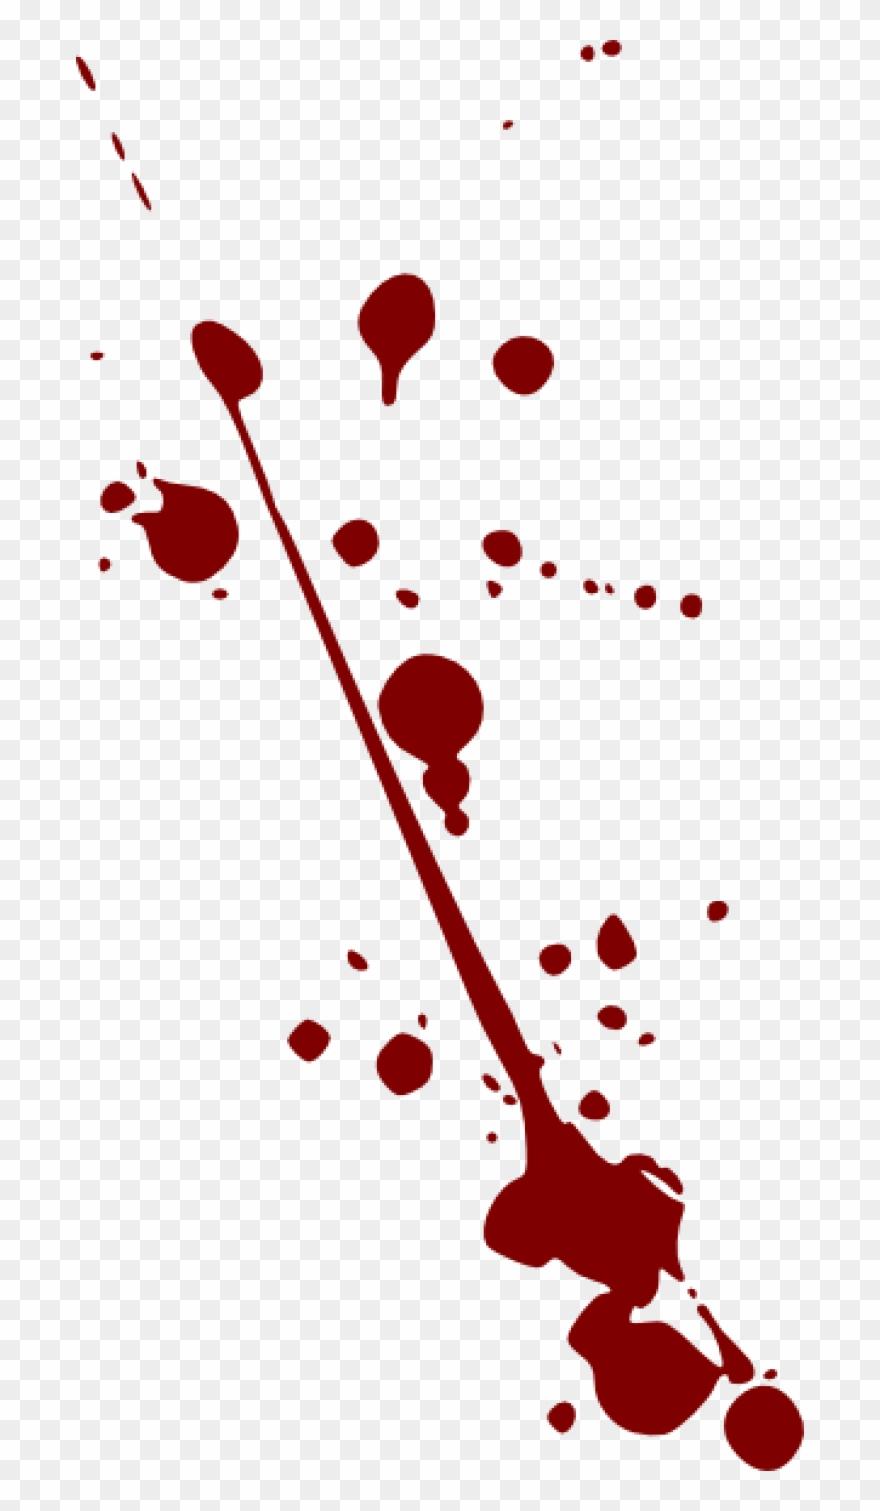 medium resolution of blood splatter clipart blood splatter clip art at clker blood splatter gif transparent png